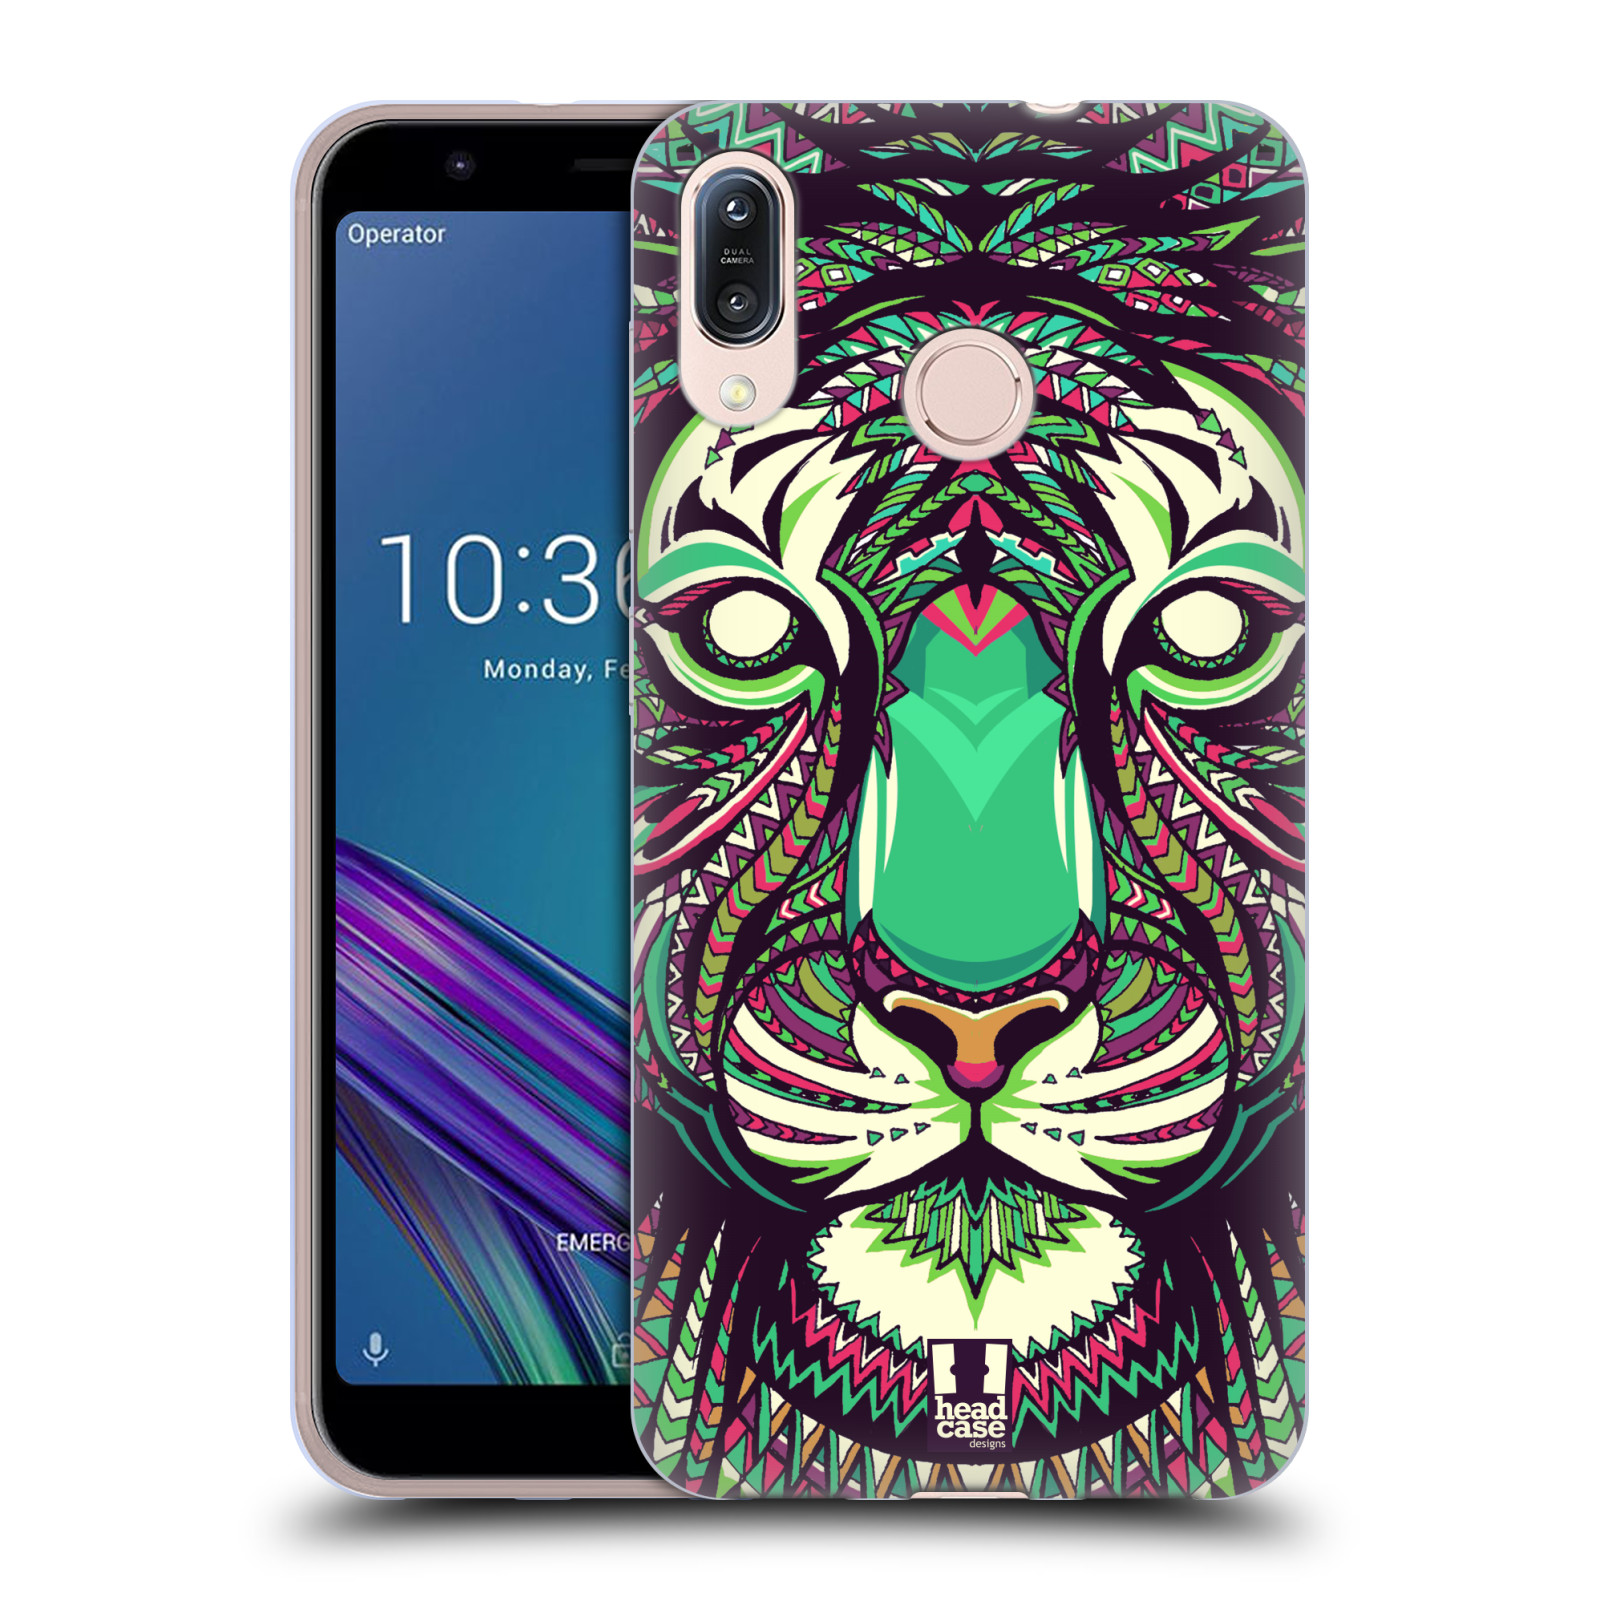 Silikonové pouzdro na mobil Asus Zenfone Max M1 ZB555KL - Head Case - AZTEC TYGR